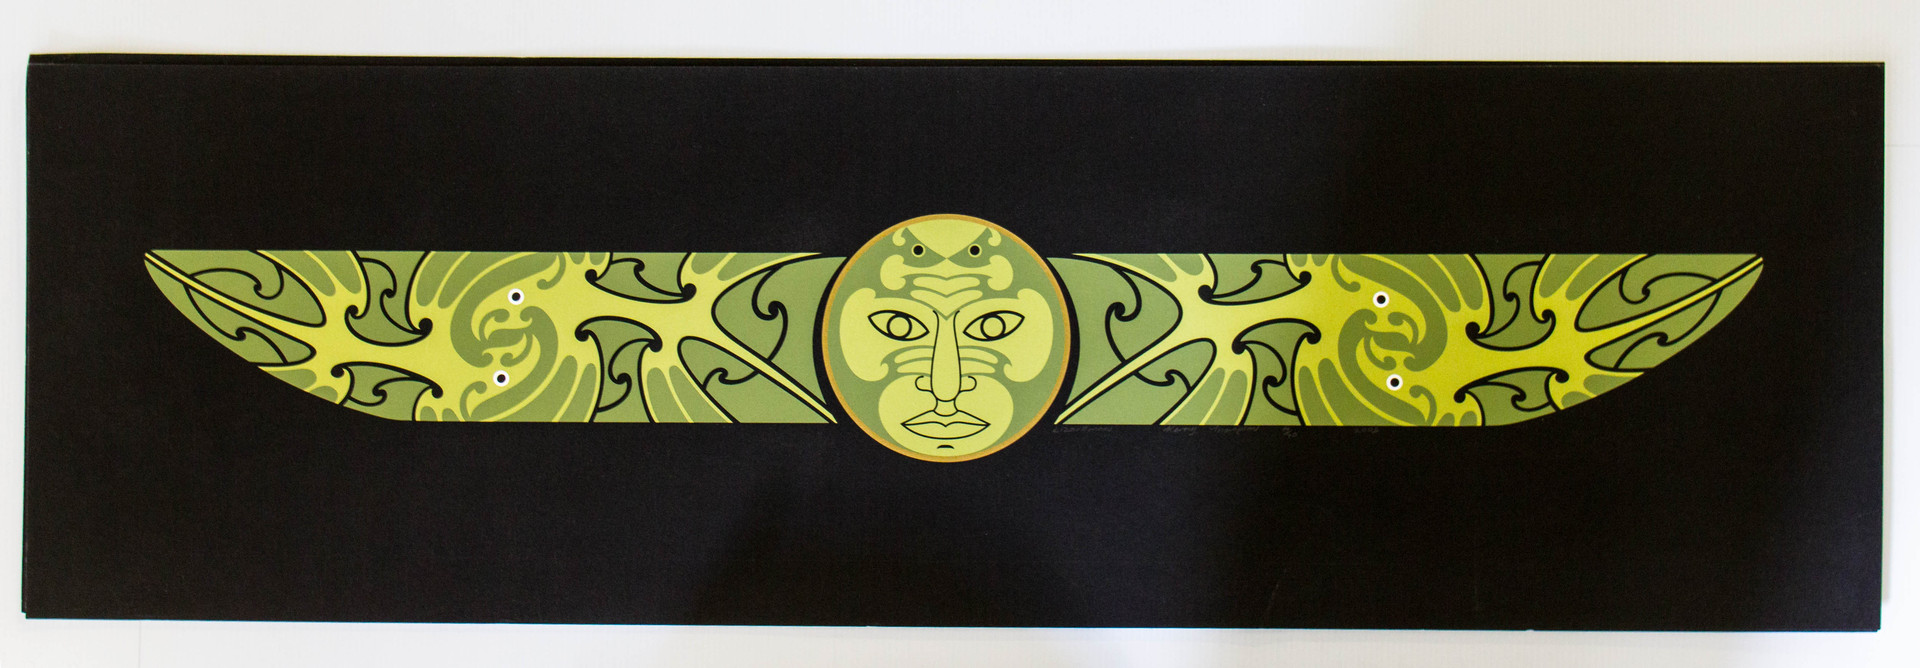 Series of Framed Prints Limited Edition 4/70 Lizard Man (Green), Birdman (Orange), Happy Fisherman (Red)